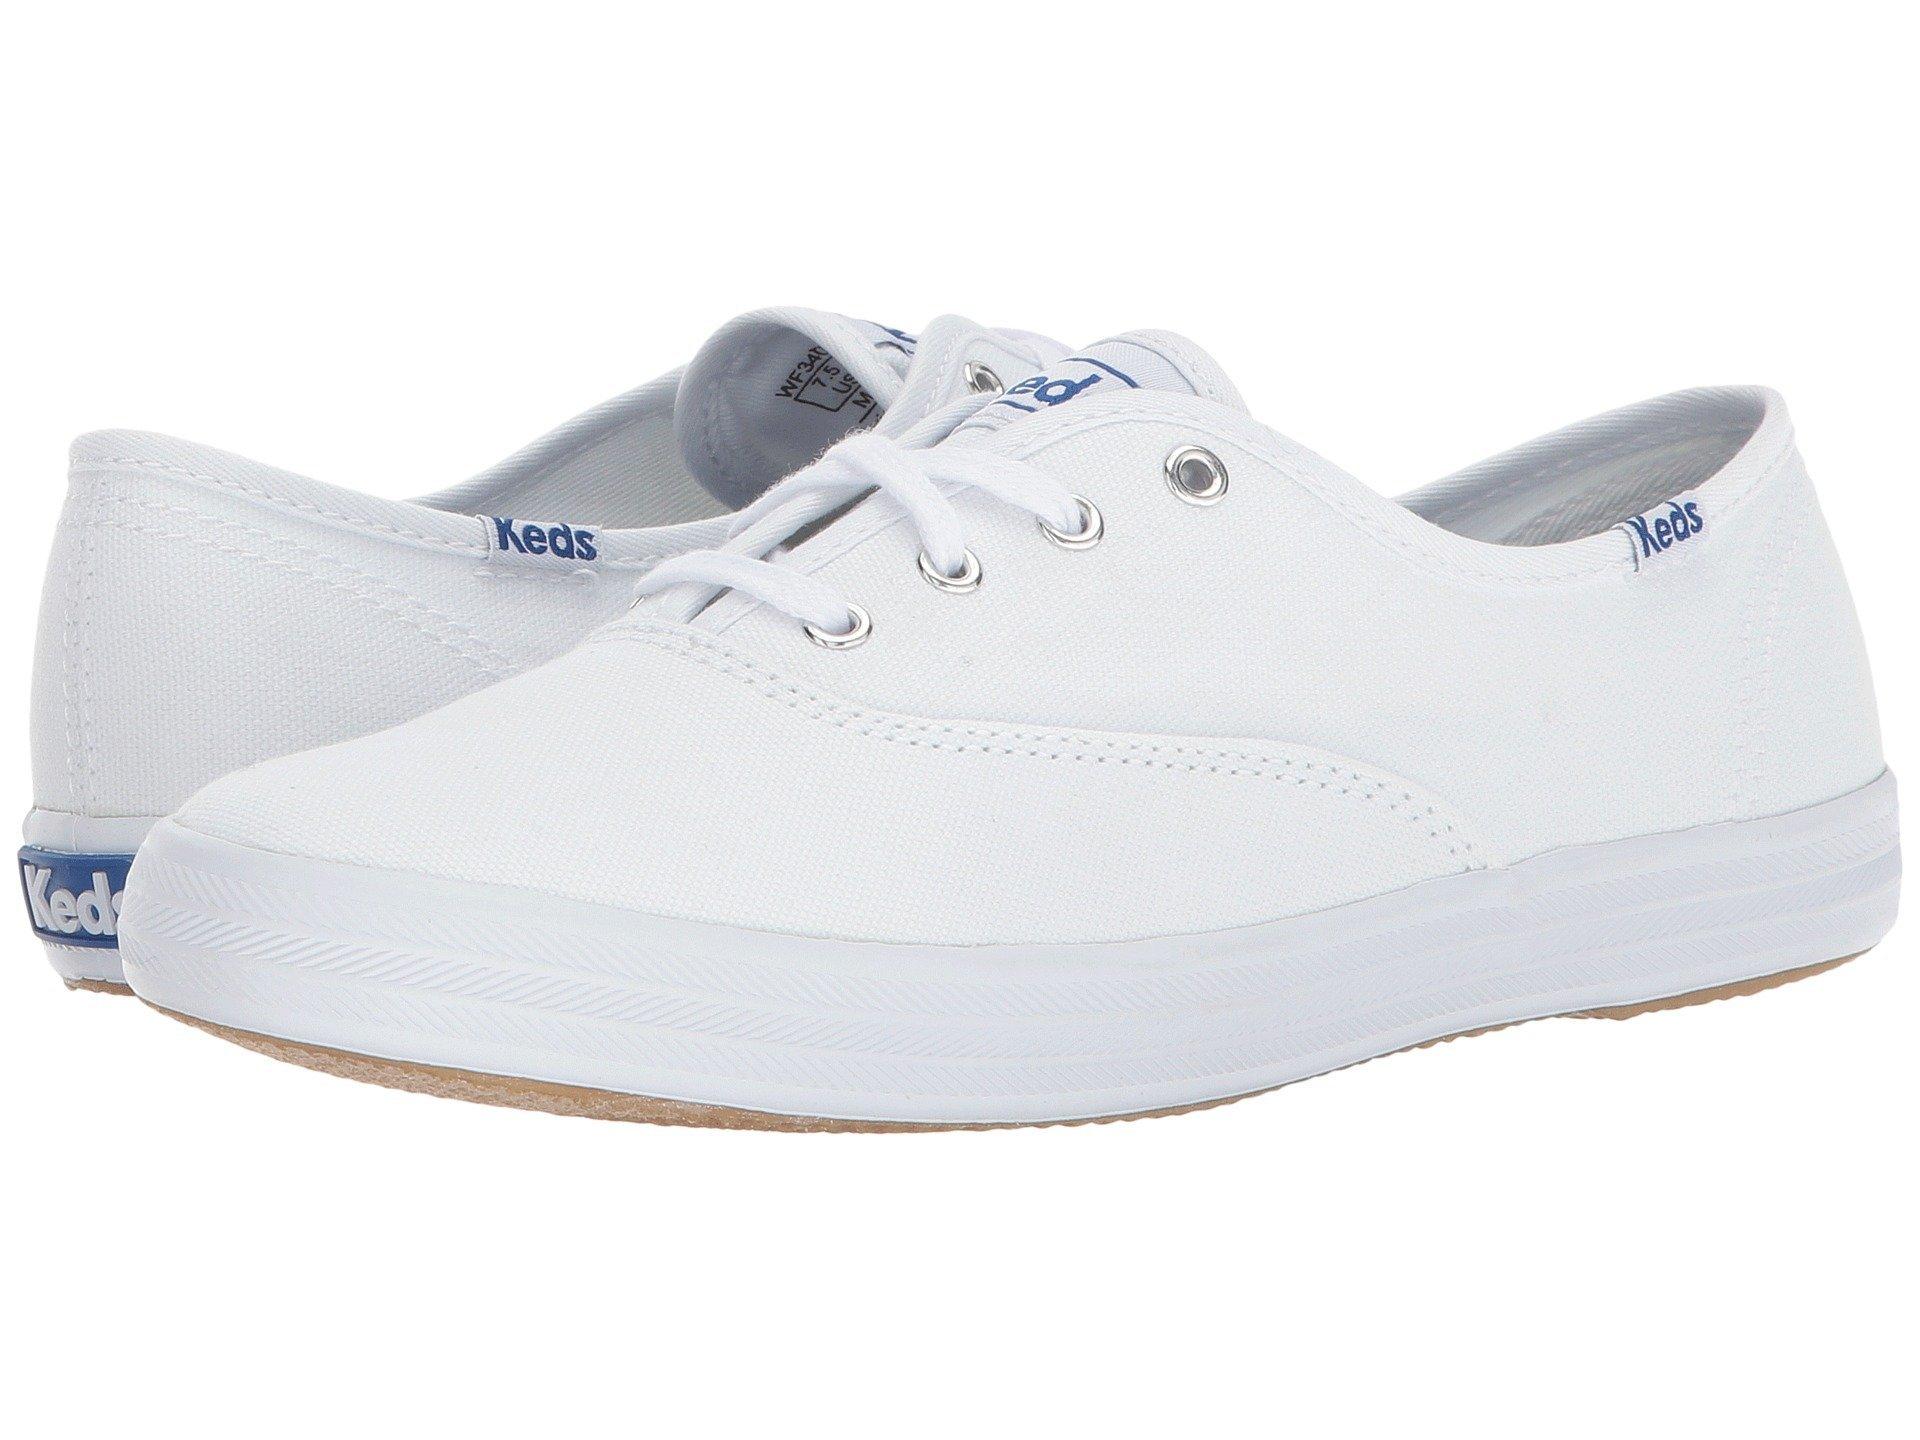 Keds Women's Champion Original Canvas Sneaker,White Canvas, 9.5 M US